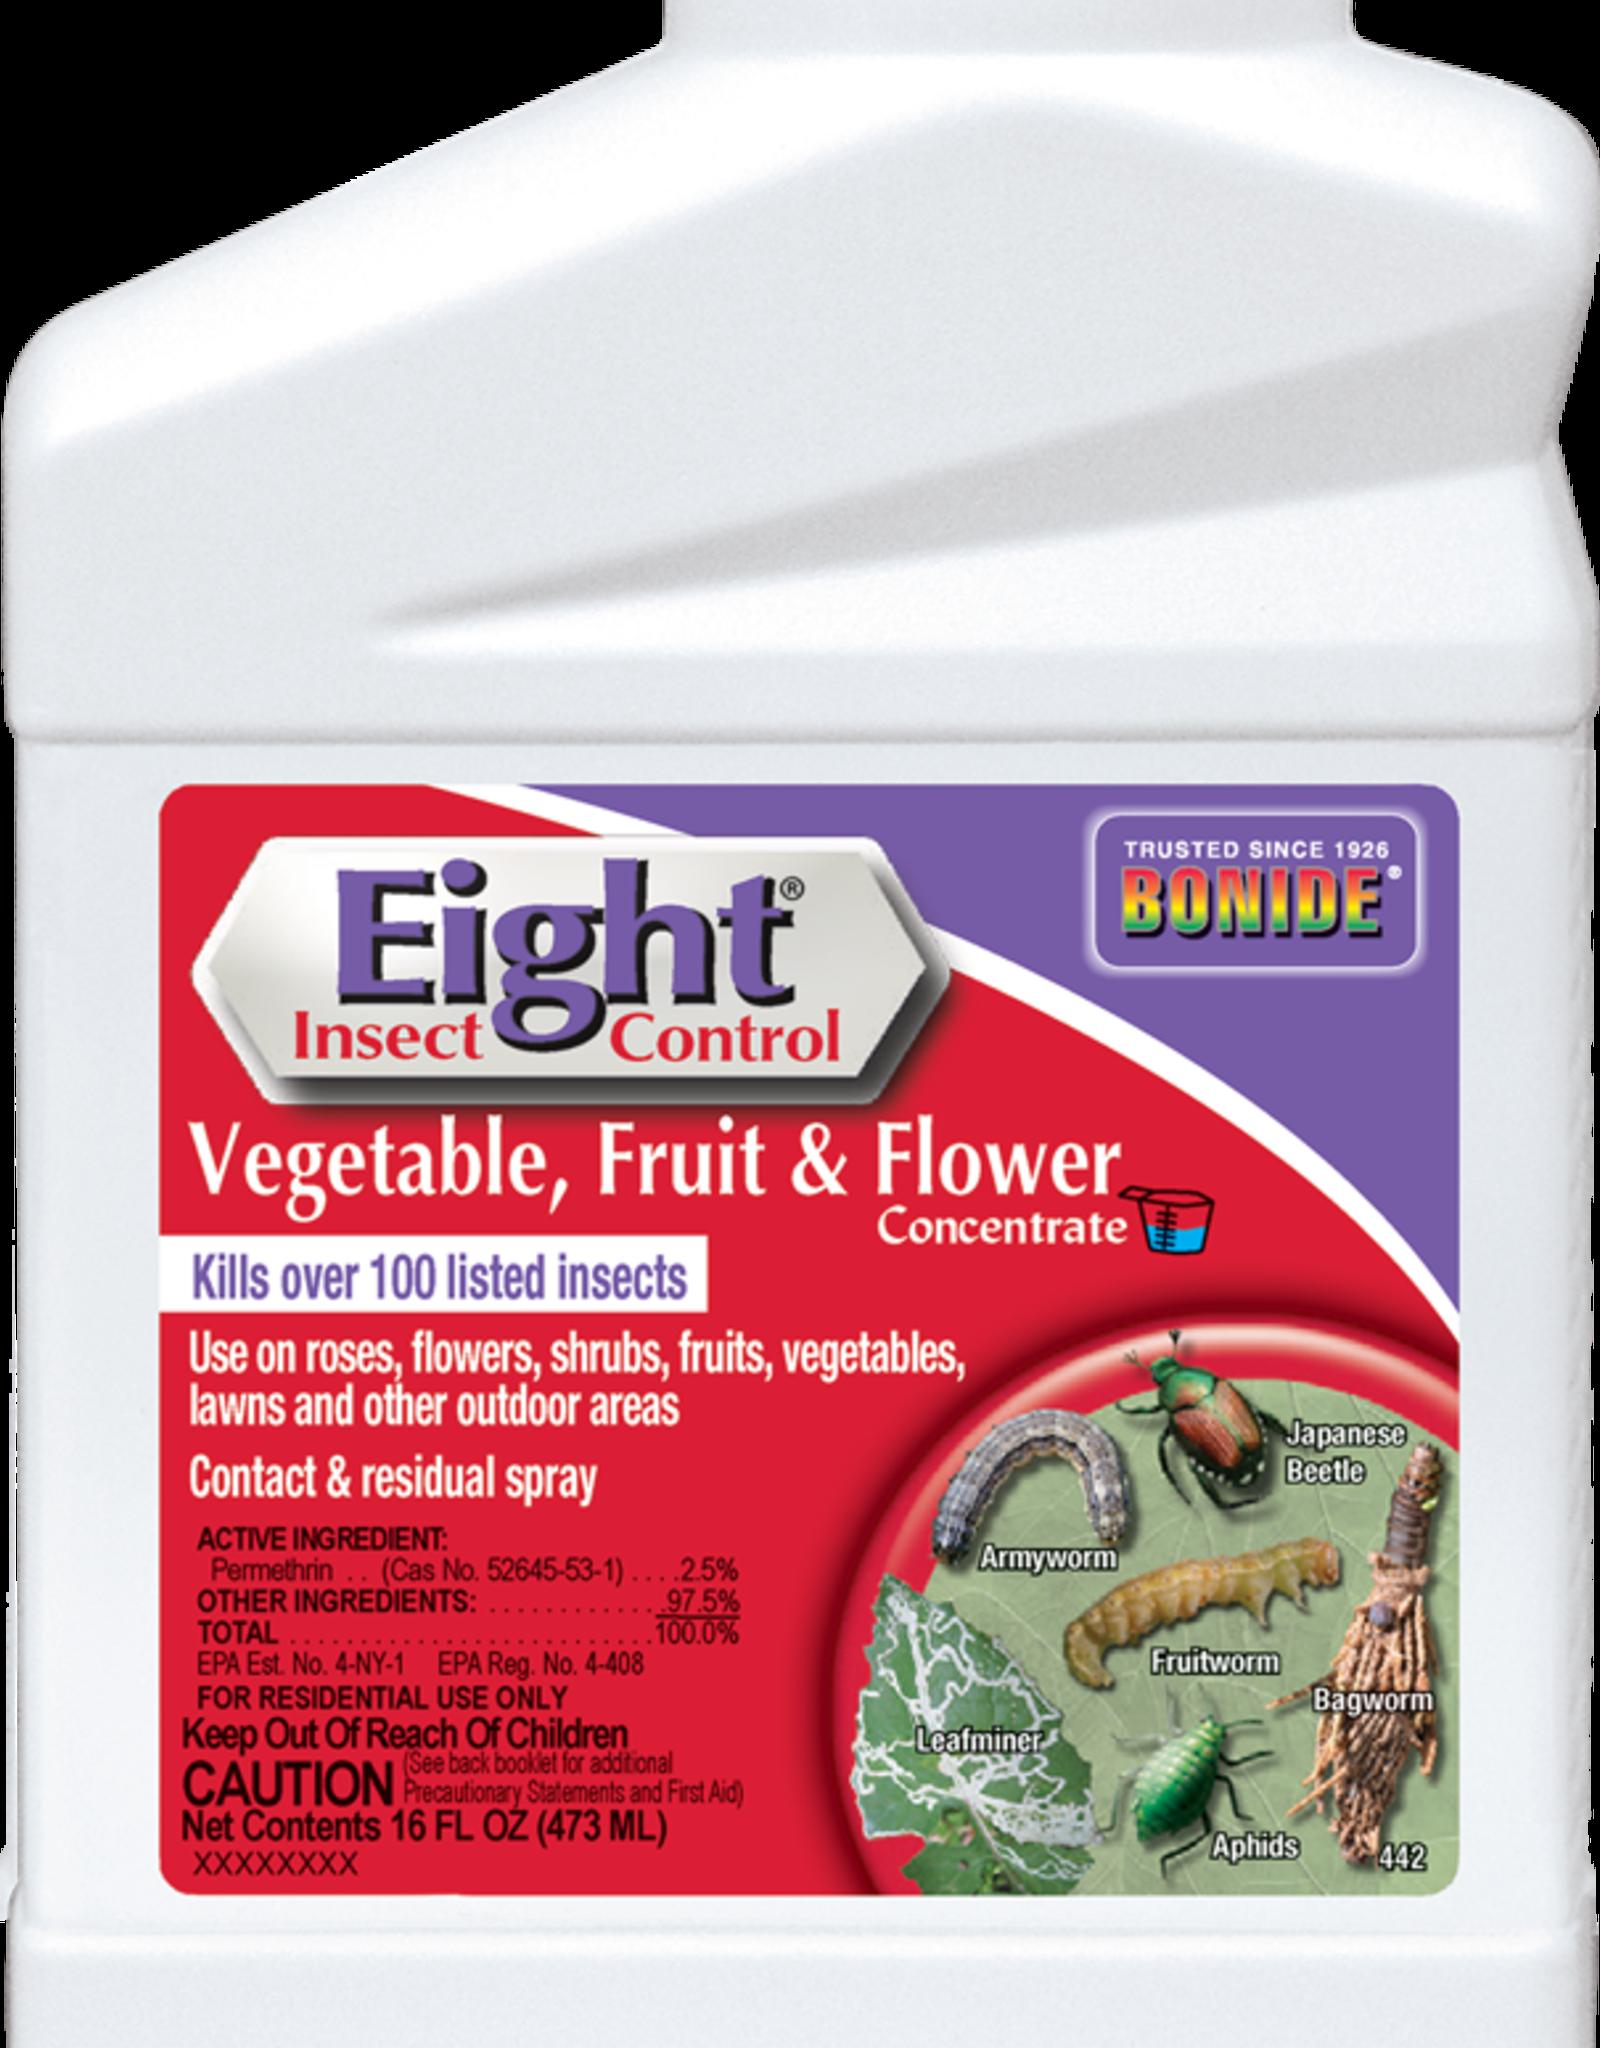 BONIDE PRODUCTS INC     P BONIDE EIGHT INSECT CONTROL VEGETABLE/FRUIT/FLOWER CONC 16OZ